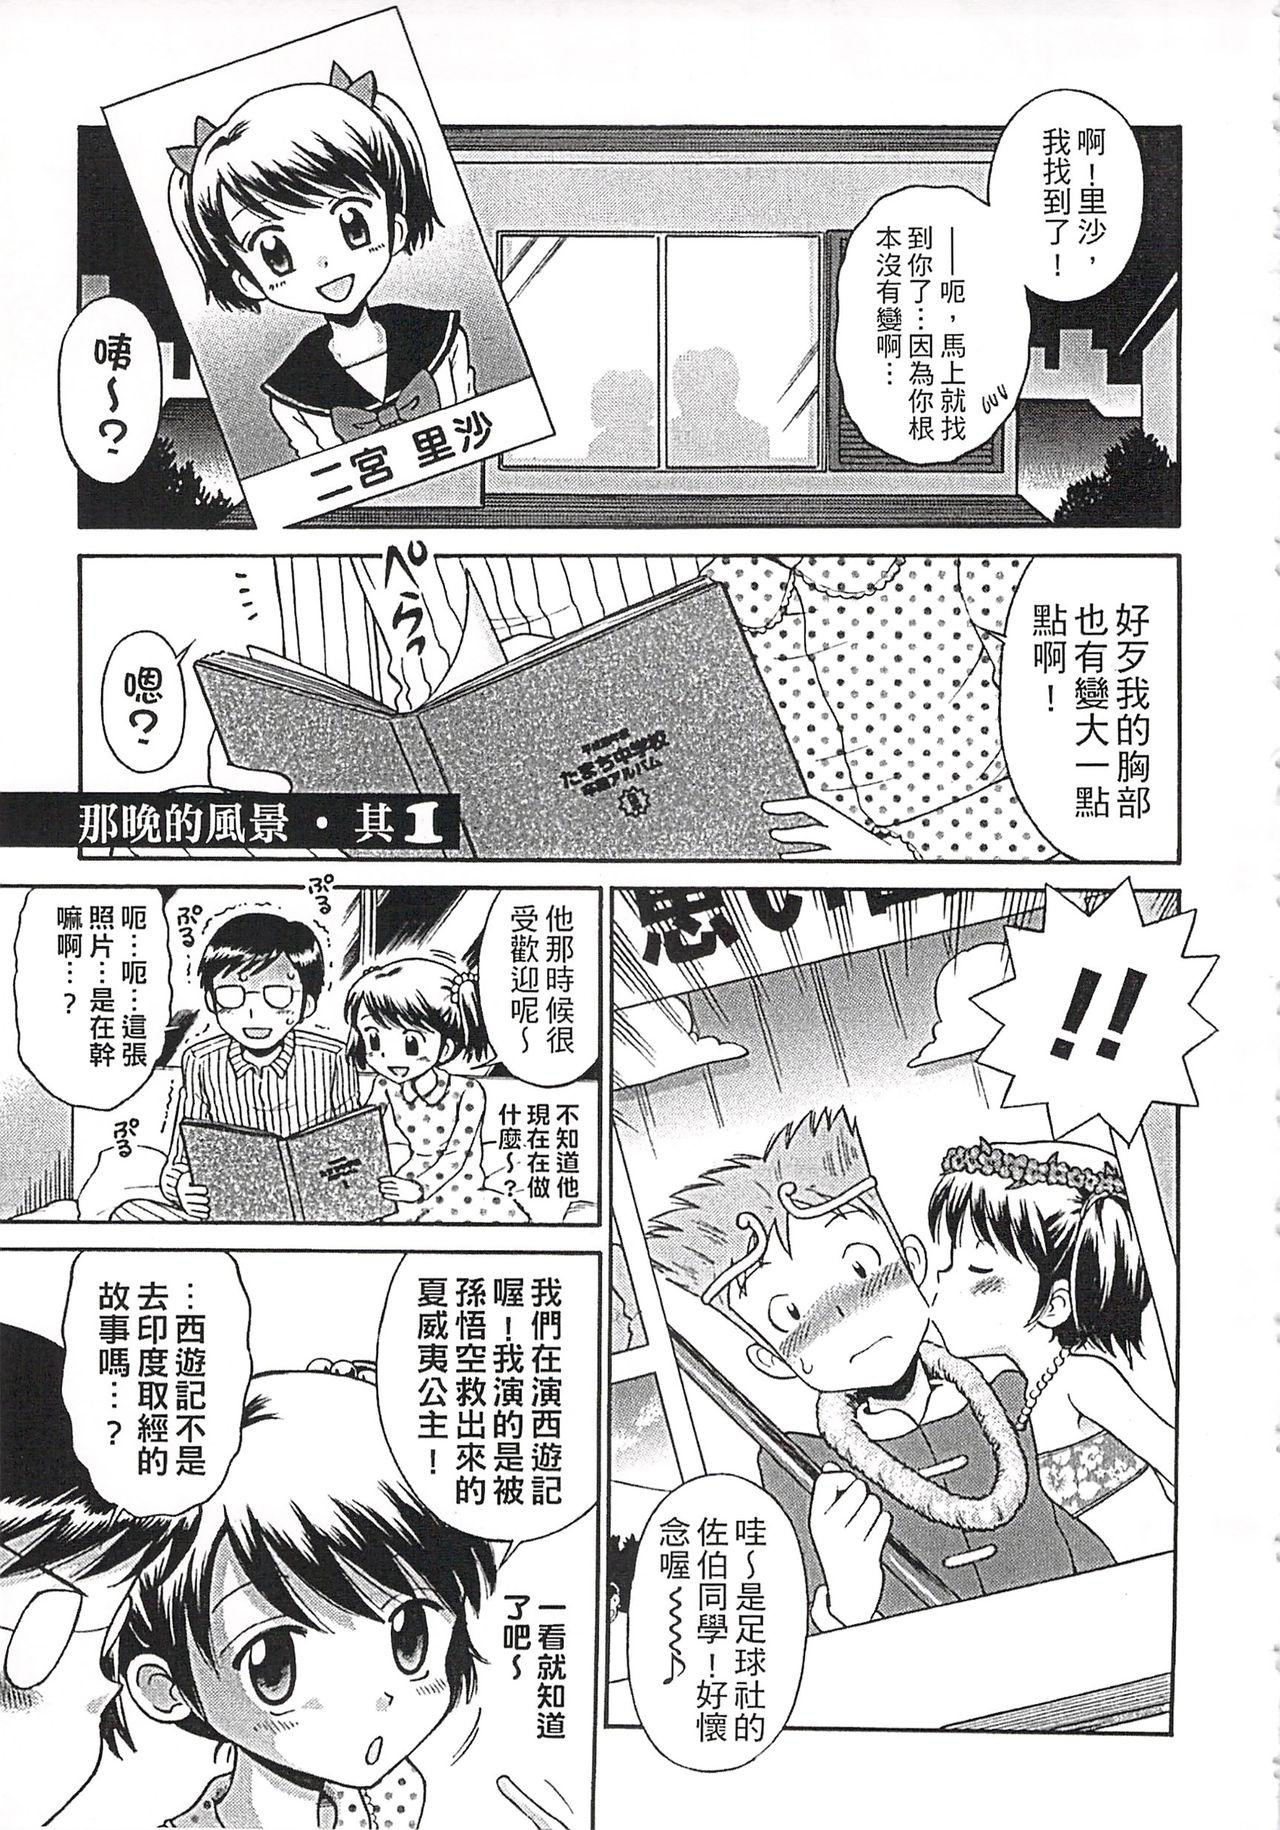 Kore demo Otona Desu Kedo!? Mrs.LOLITA Kanzenban   人家是大人啦! ~Mrs.LOLITA完全版 60